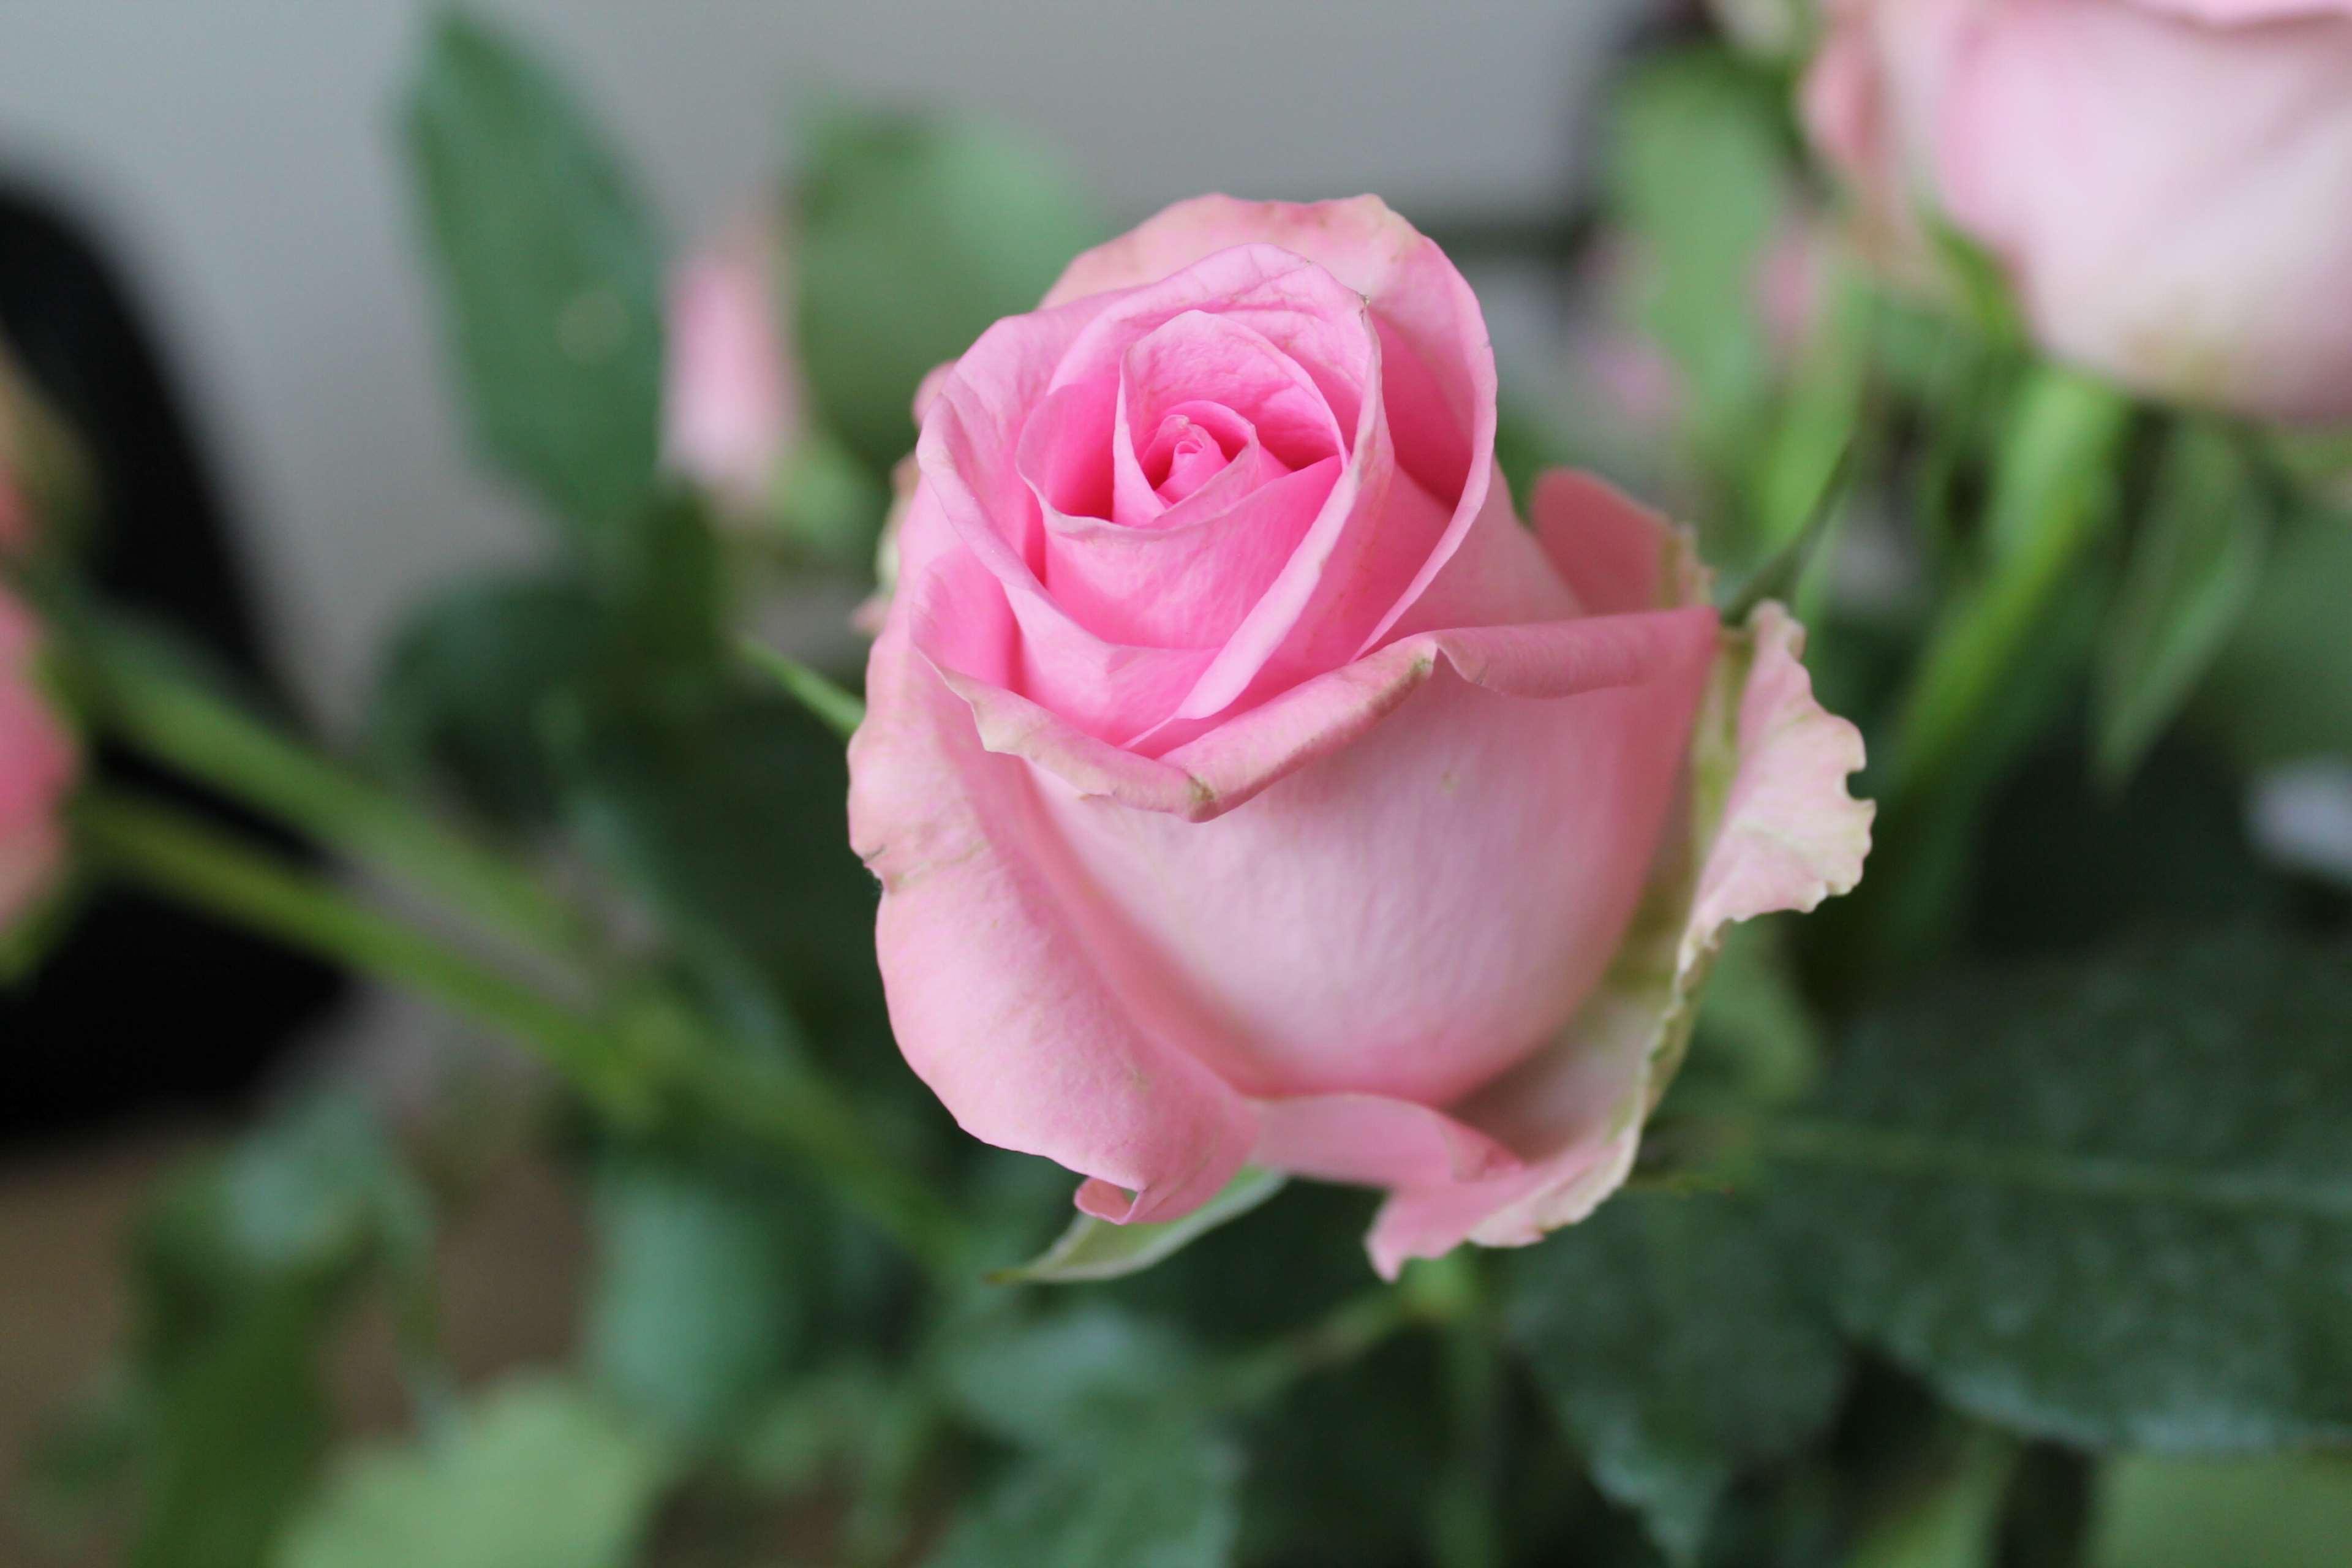 Flower, Flowers, Green, Leaves, Nature, Pink, Rose, - Pink Rose 4k , HD Wallpaper & Backgrounds